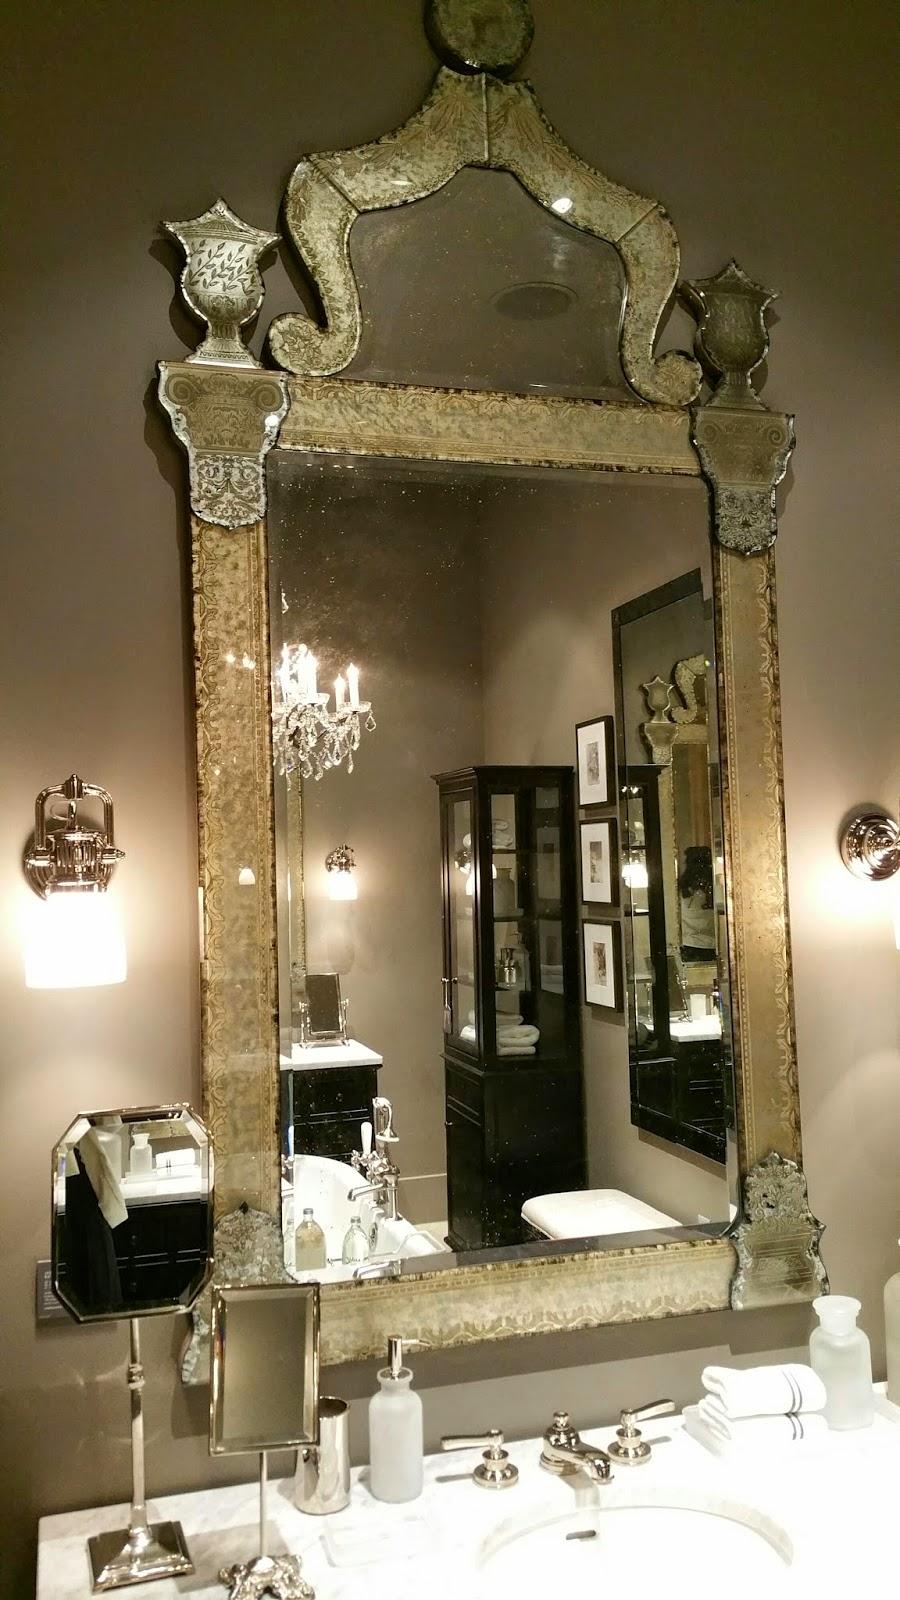 A Home for Elegance: My Spectacular Visit to Restoration Hardware